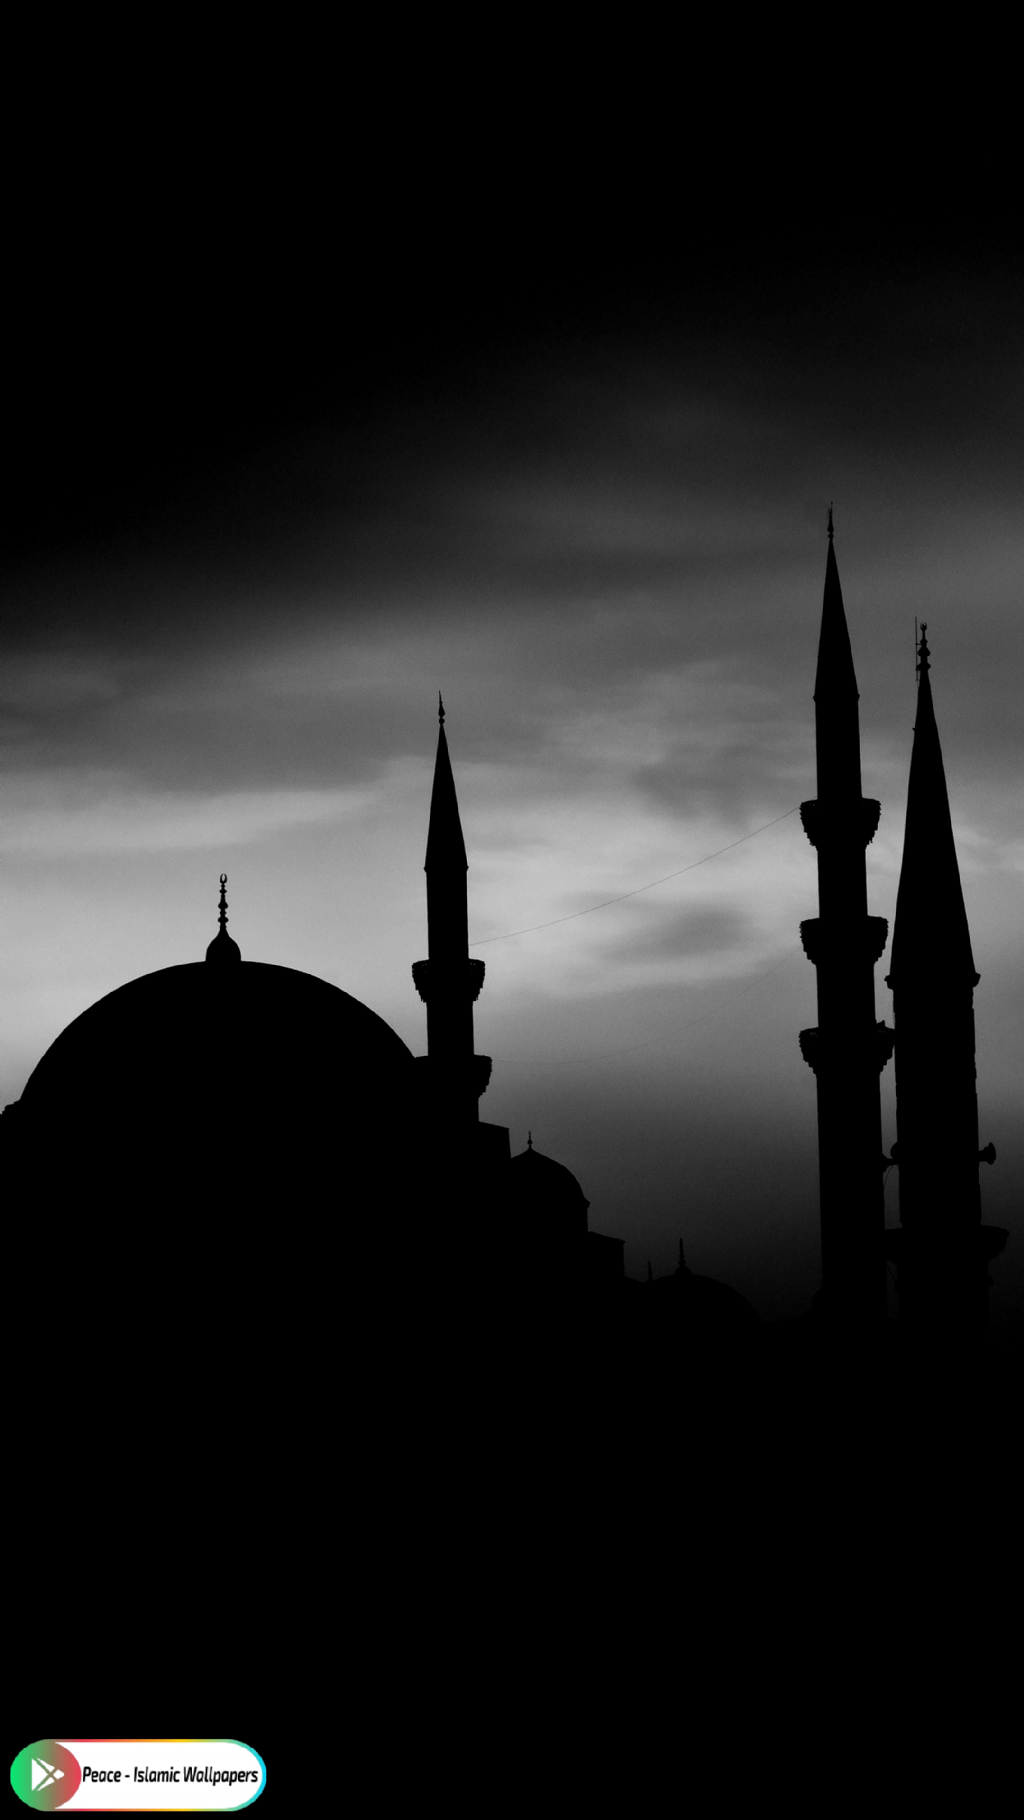 Fajr Islamic Wallpaper In 2020 Phone Wallpaper Quotes Islamic